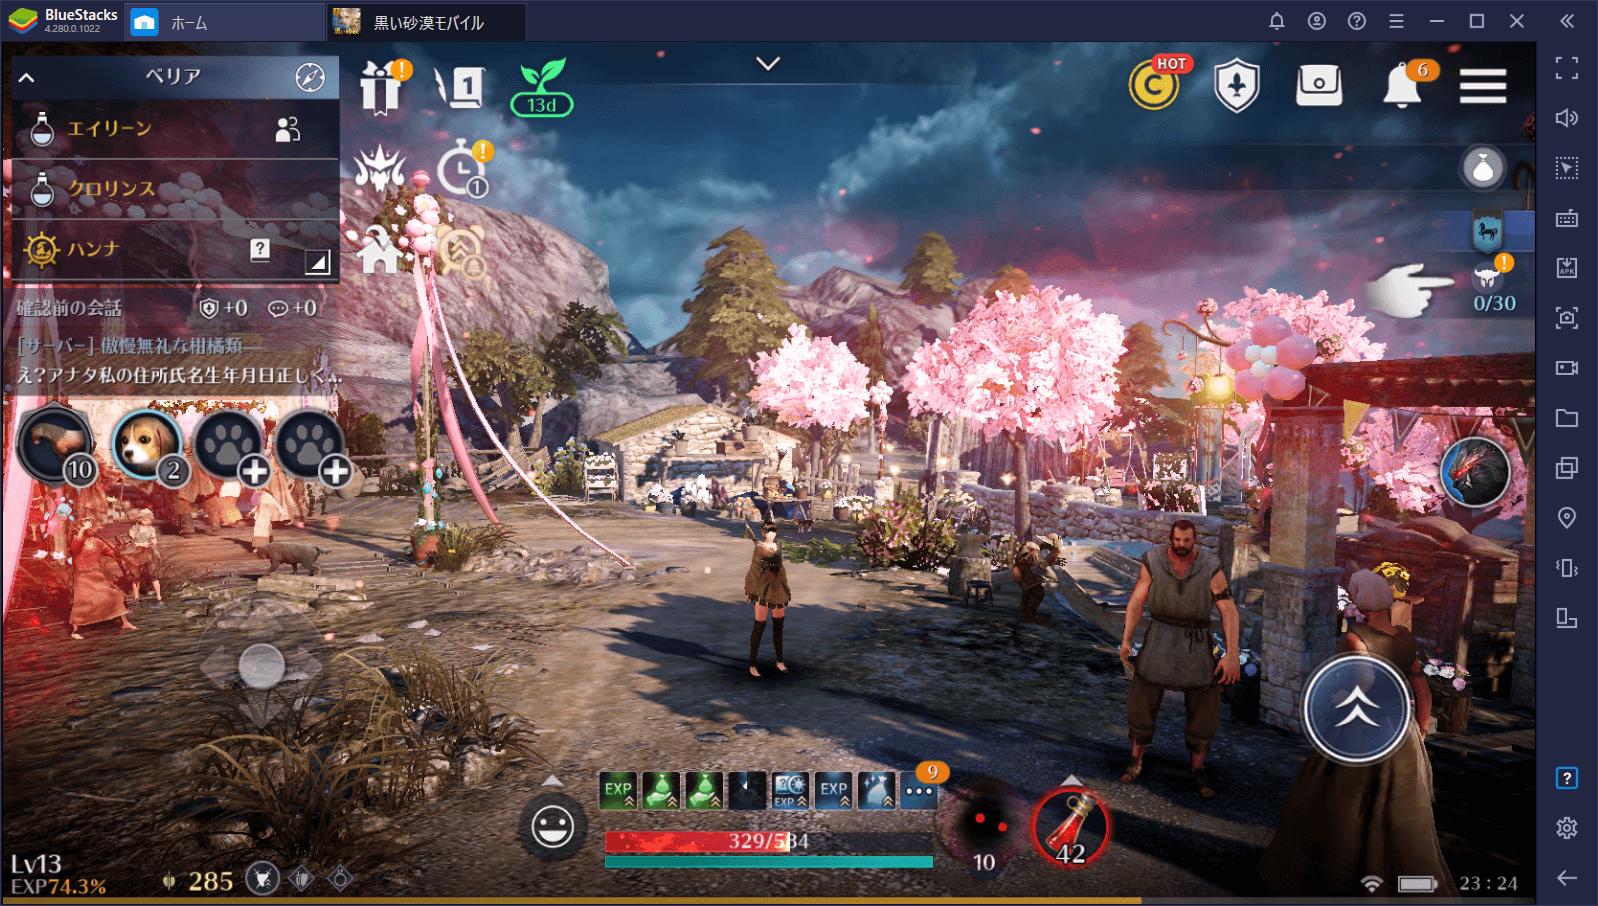 BlueStacks:『黒い砂漠 MOBILE』をゲームパッドで遊んでみよう